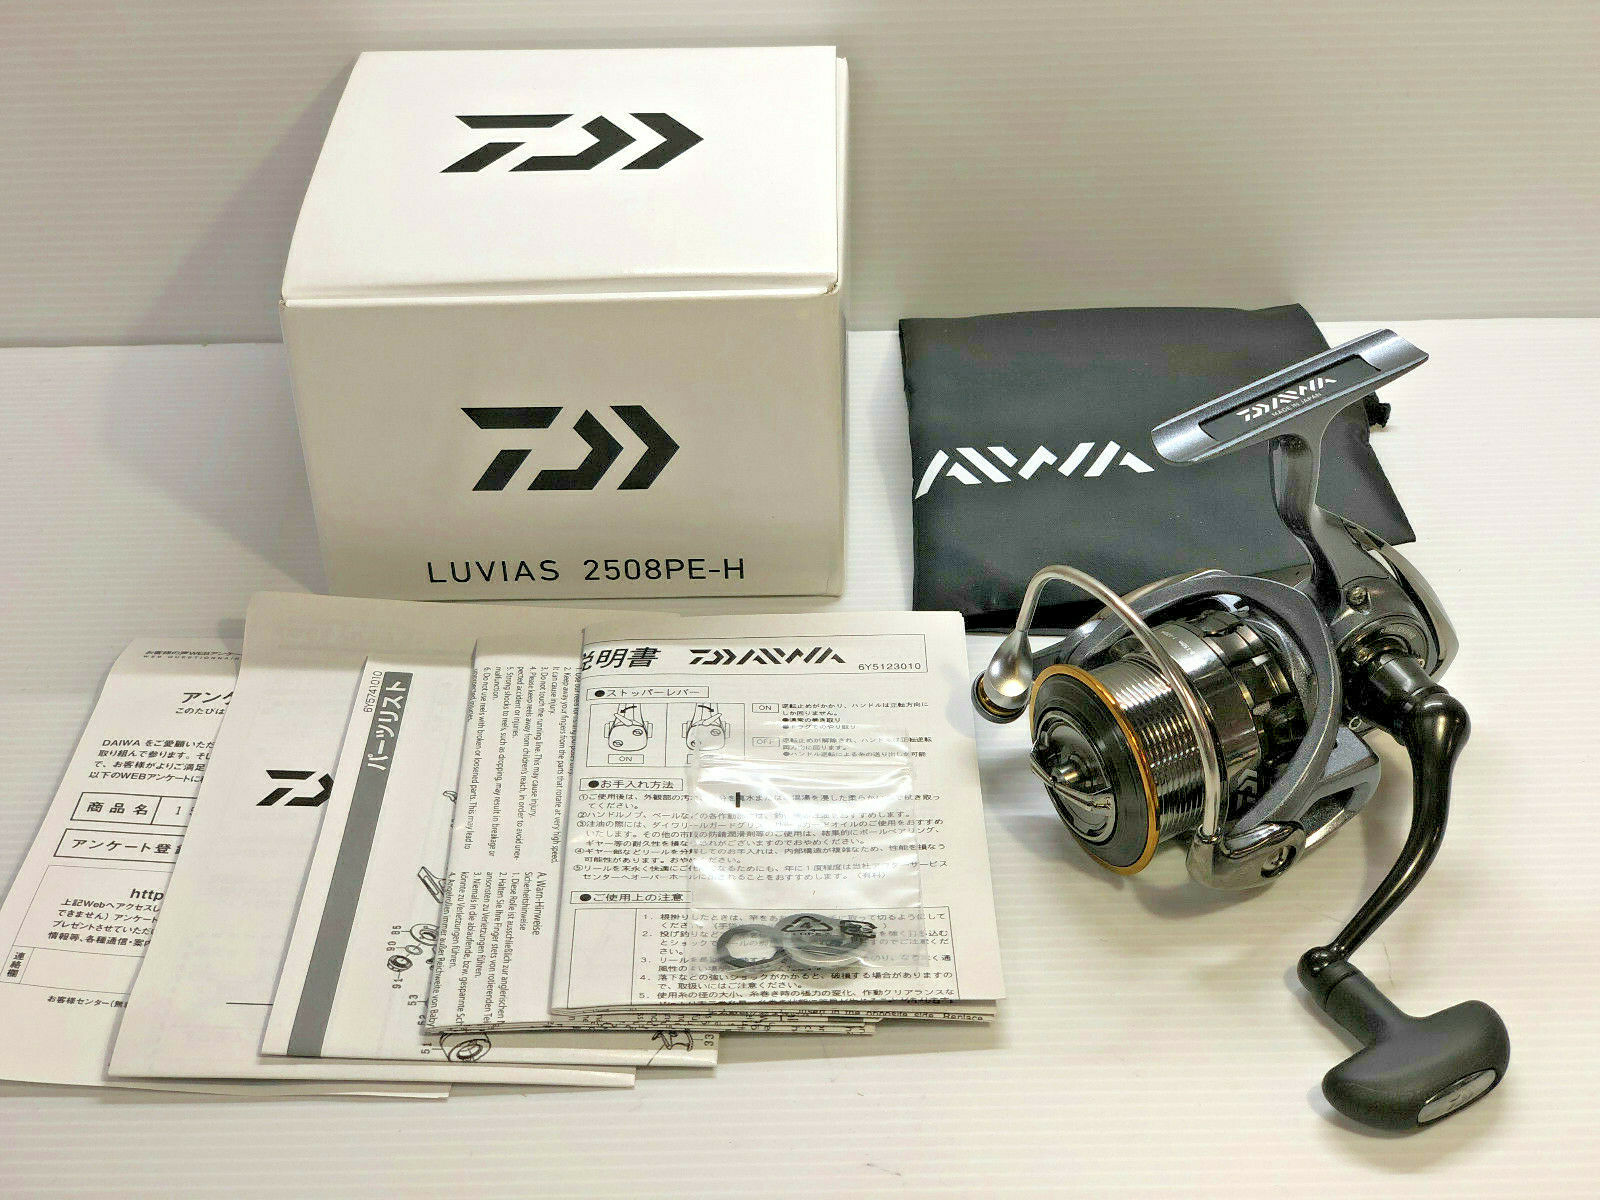 DAIWA 15 LUVIAS 2508PEH    Free Shipping from Japan